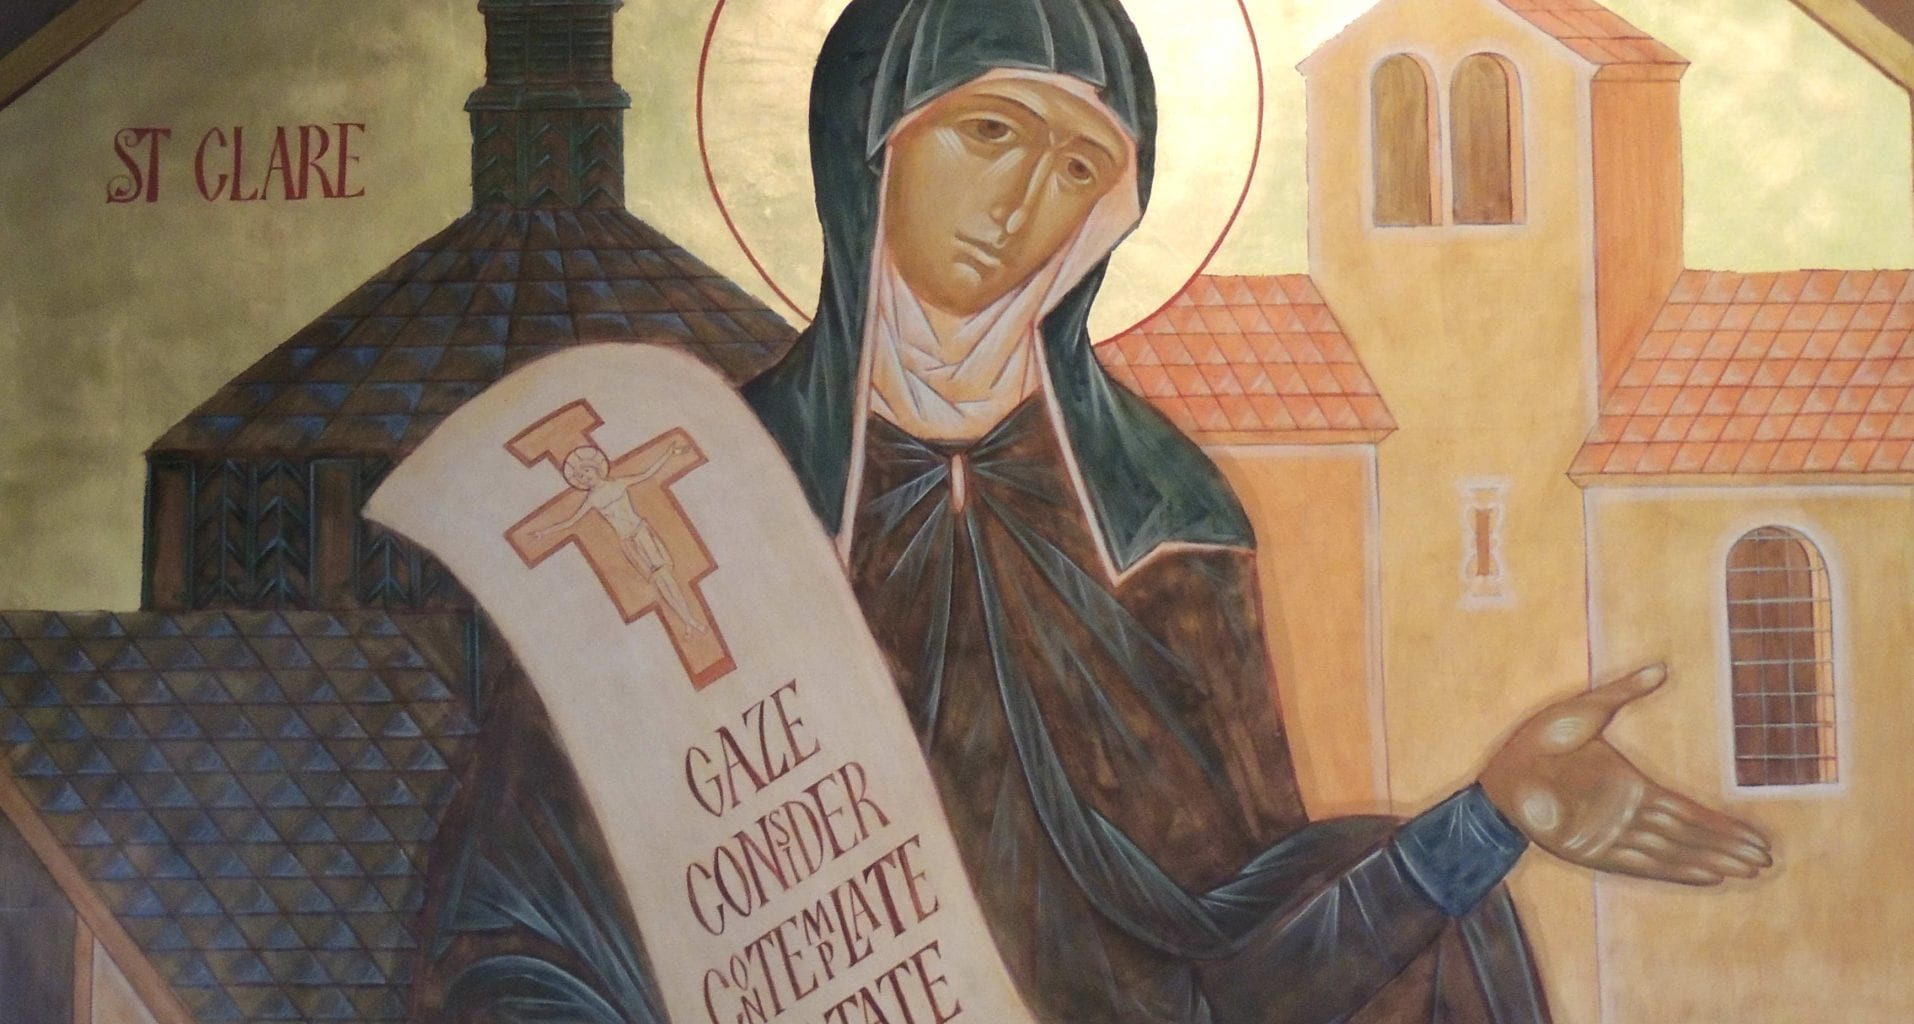 Clare icon his indescribable delight